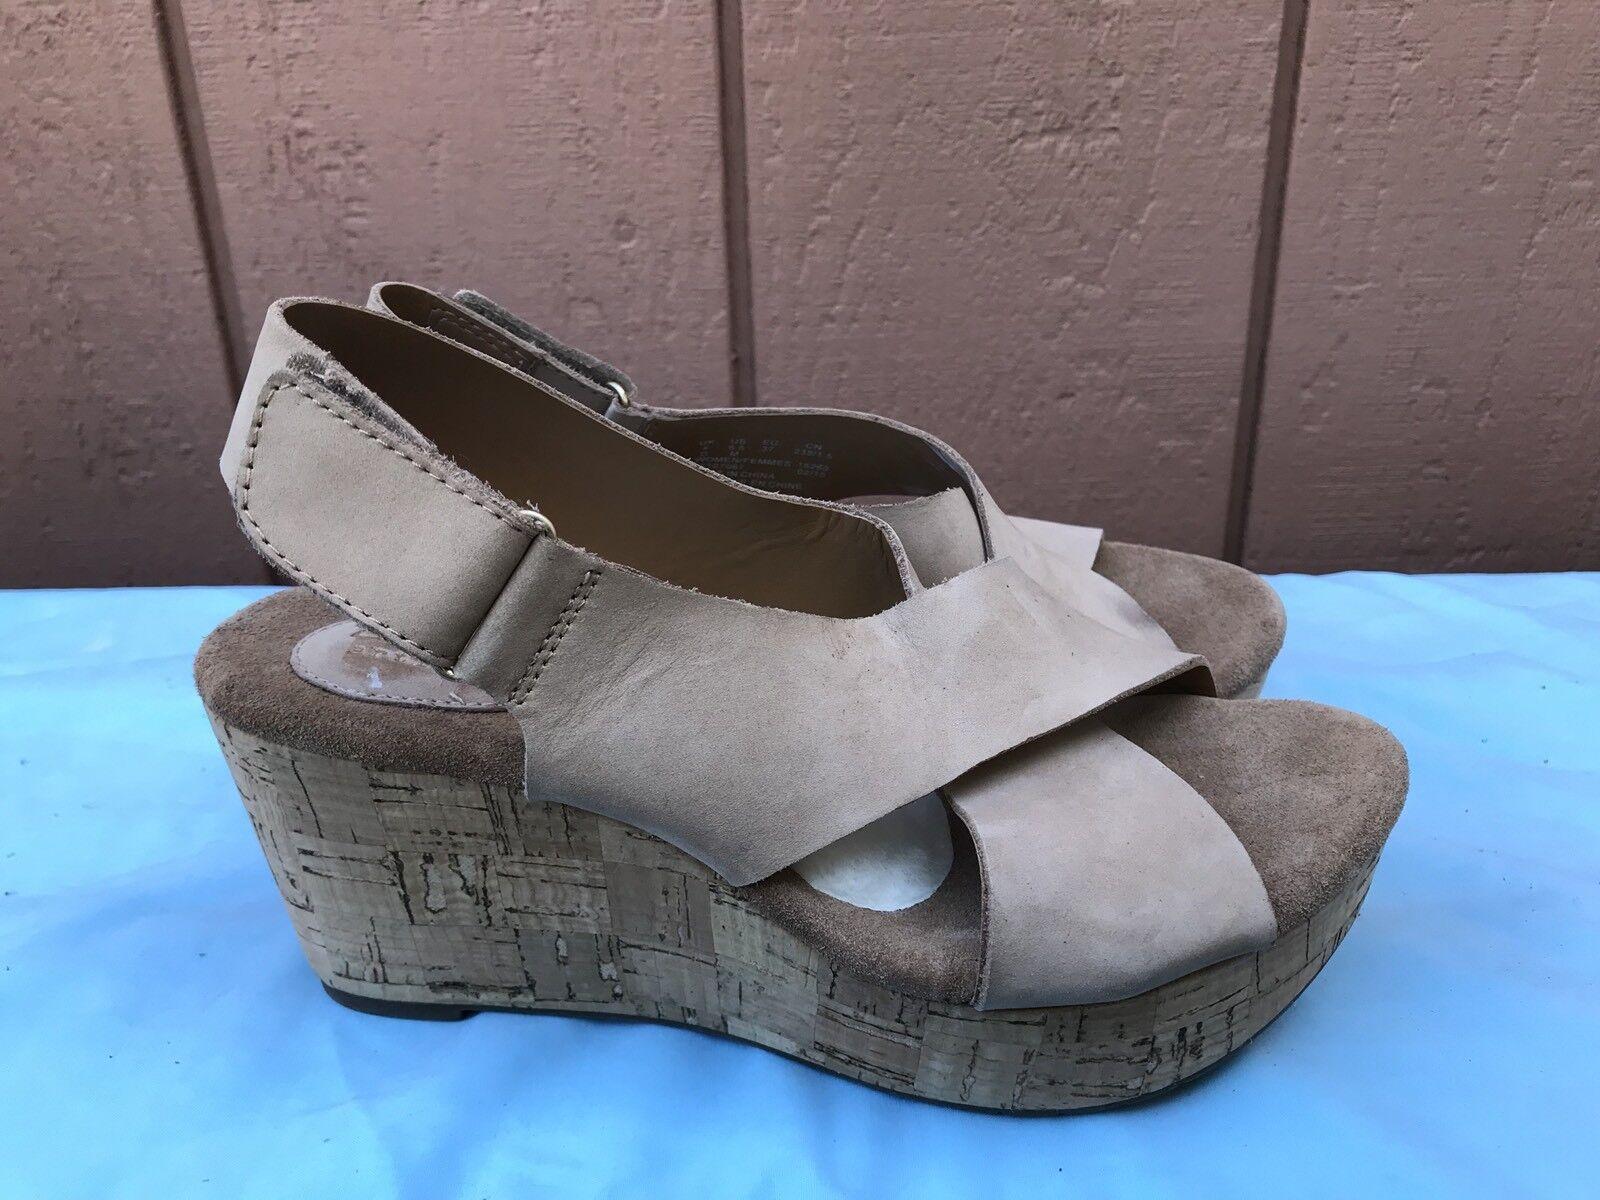 Nuevo Mujeres Clarks Artisan Caslynn Shae 6.5M Zapato Sandalia de cuña luz Tan Nubuck A6